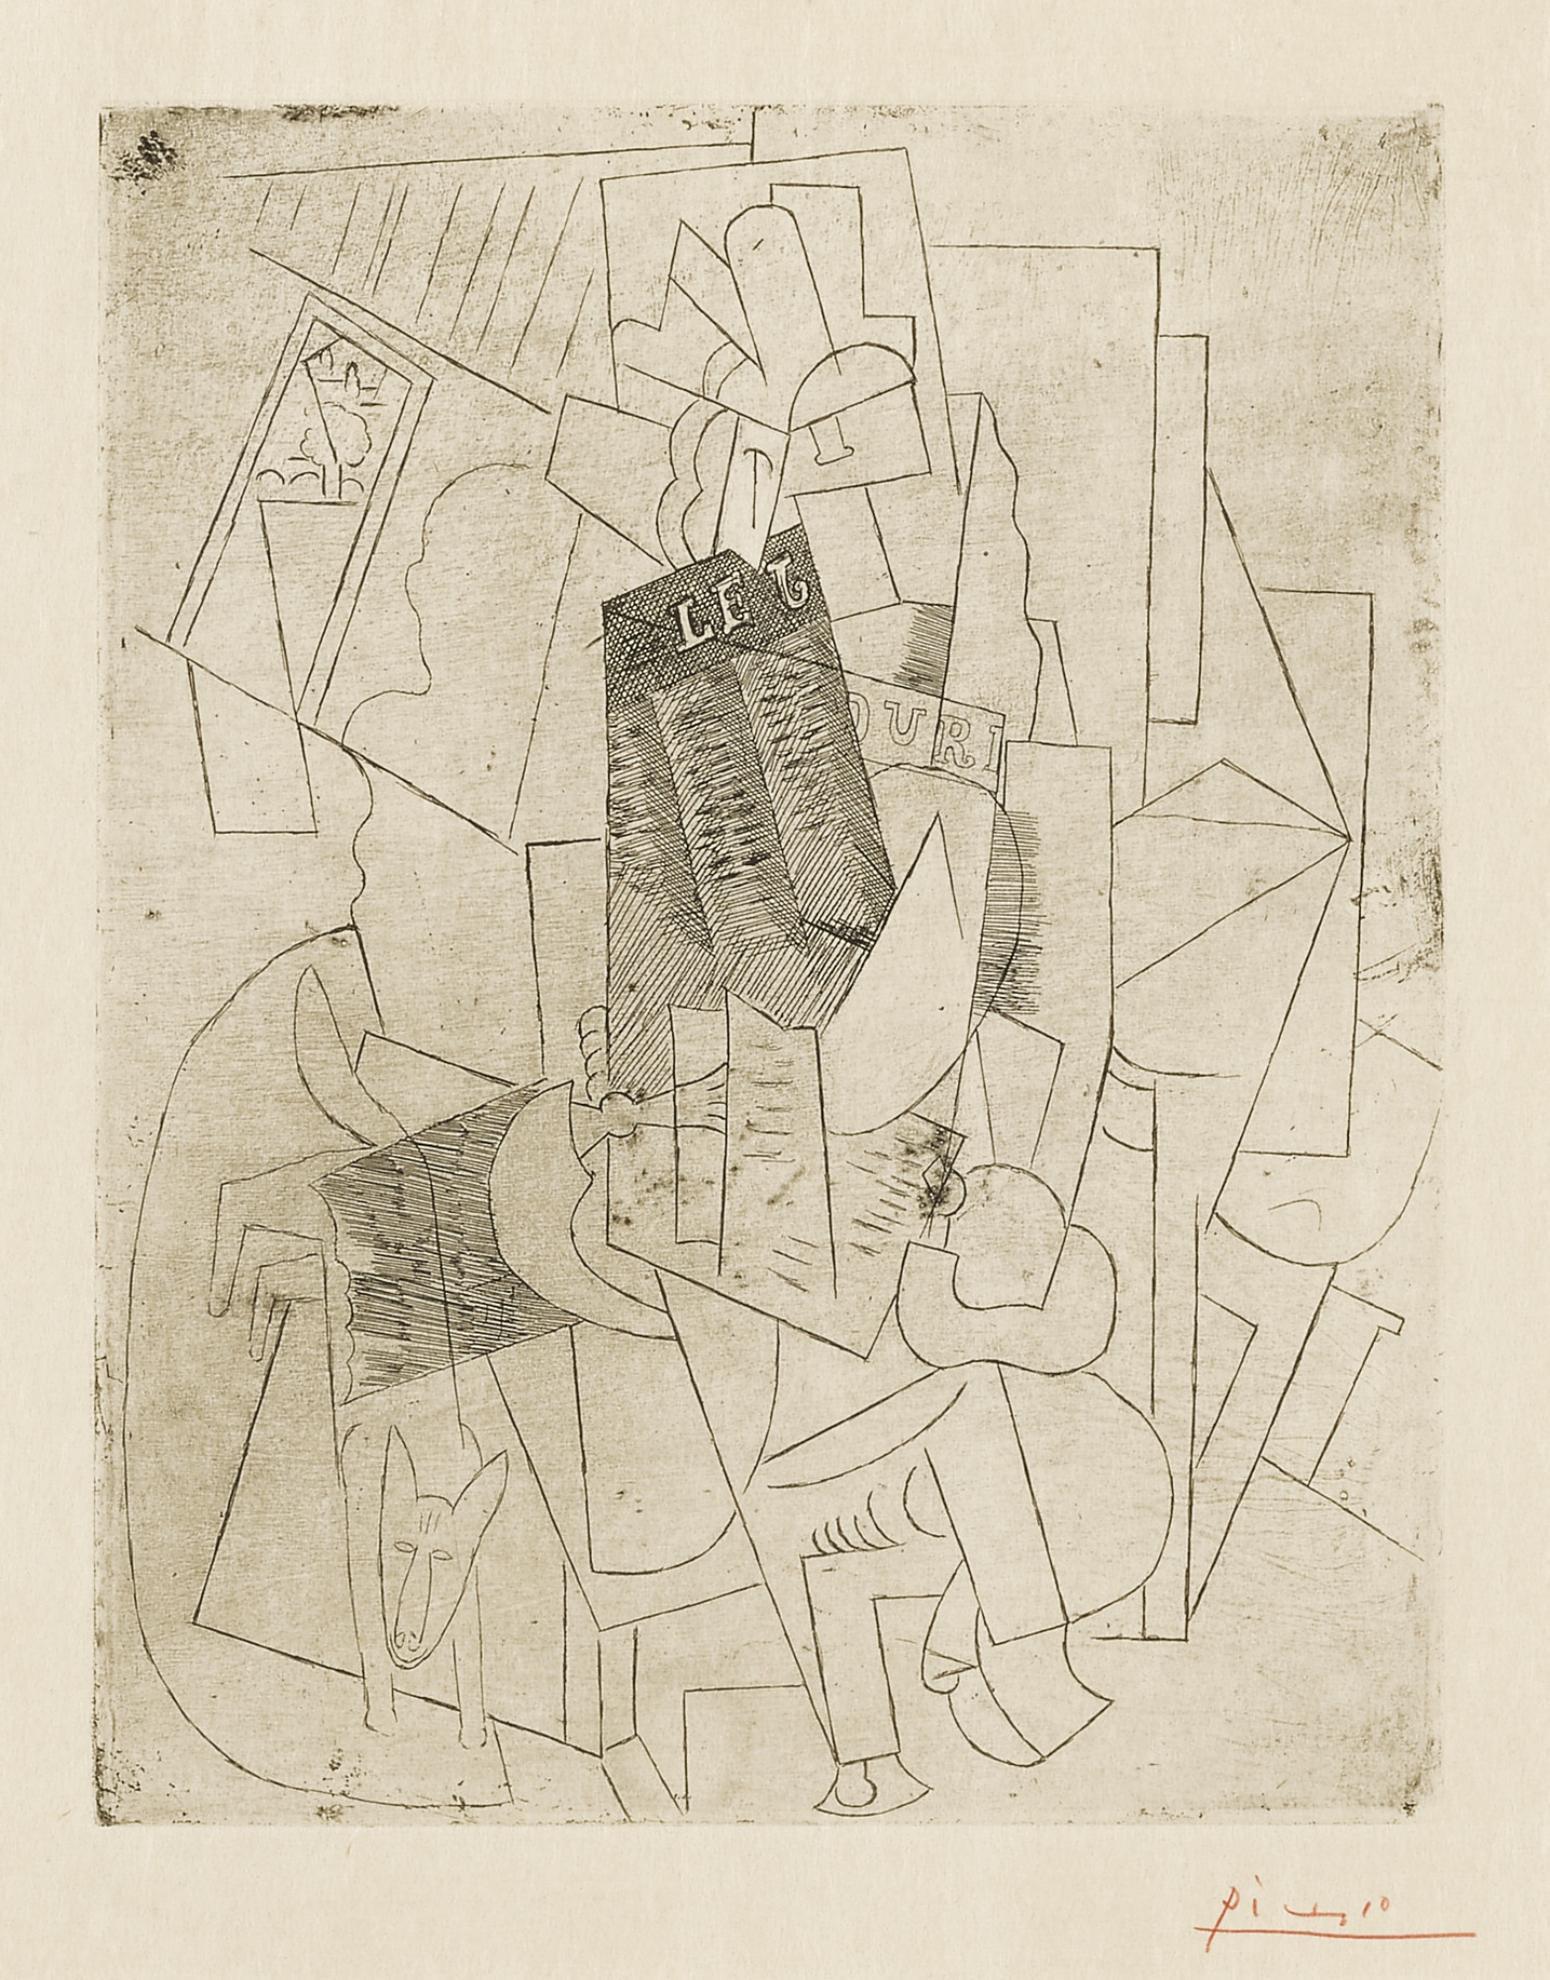 Pablo Picasso-Lhomme Au Chien (Rue Schoelcher) (B. 28; Ba. 39)-1915